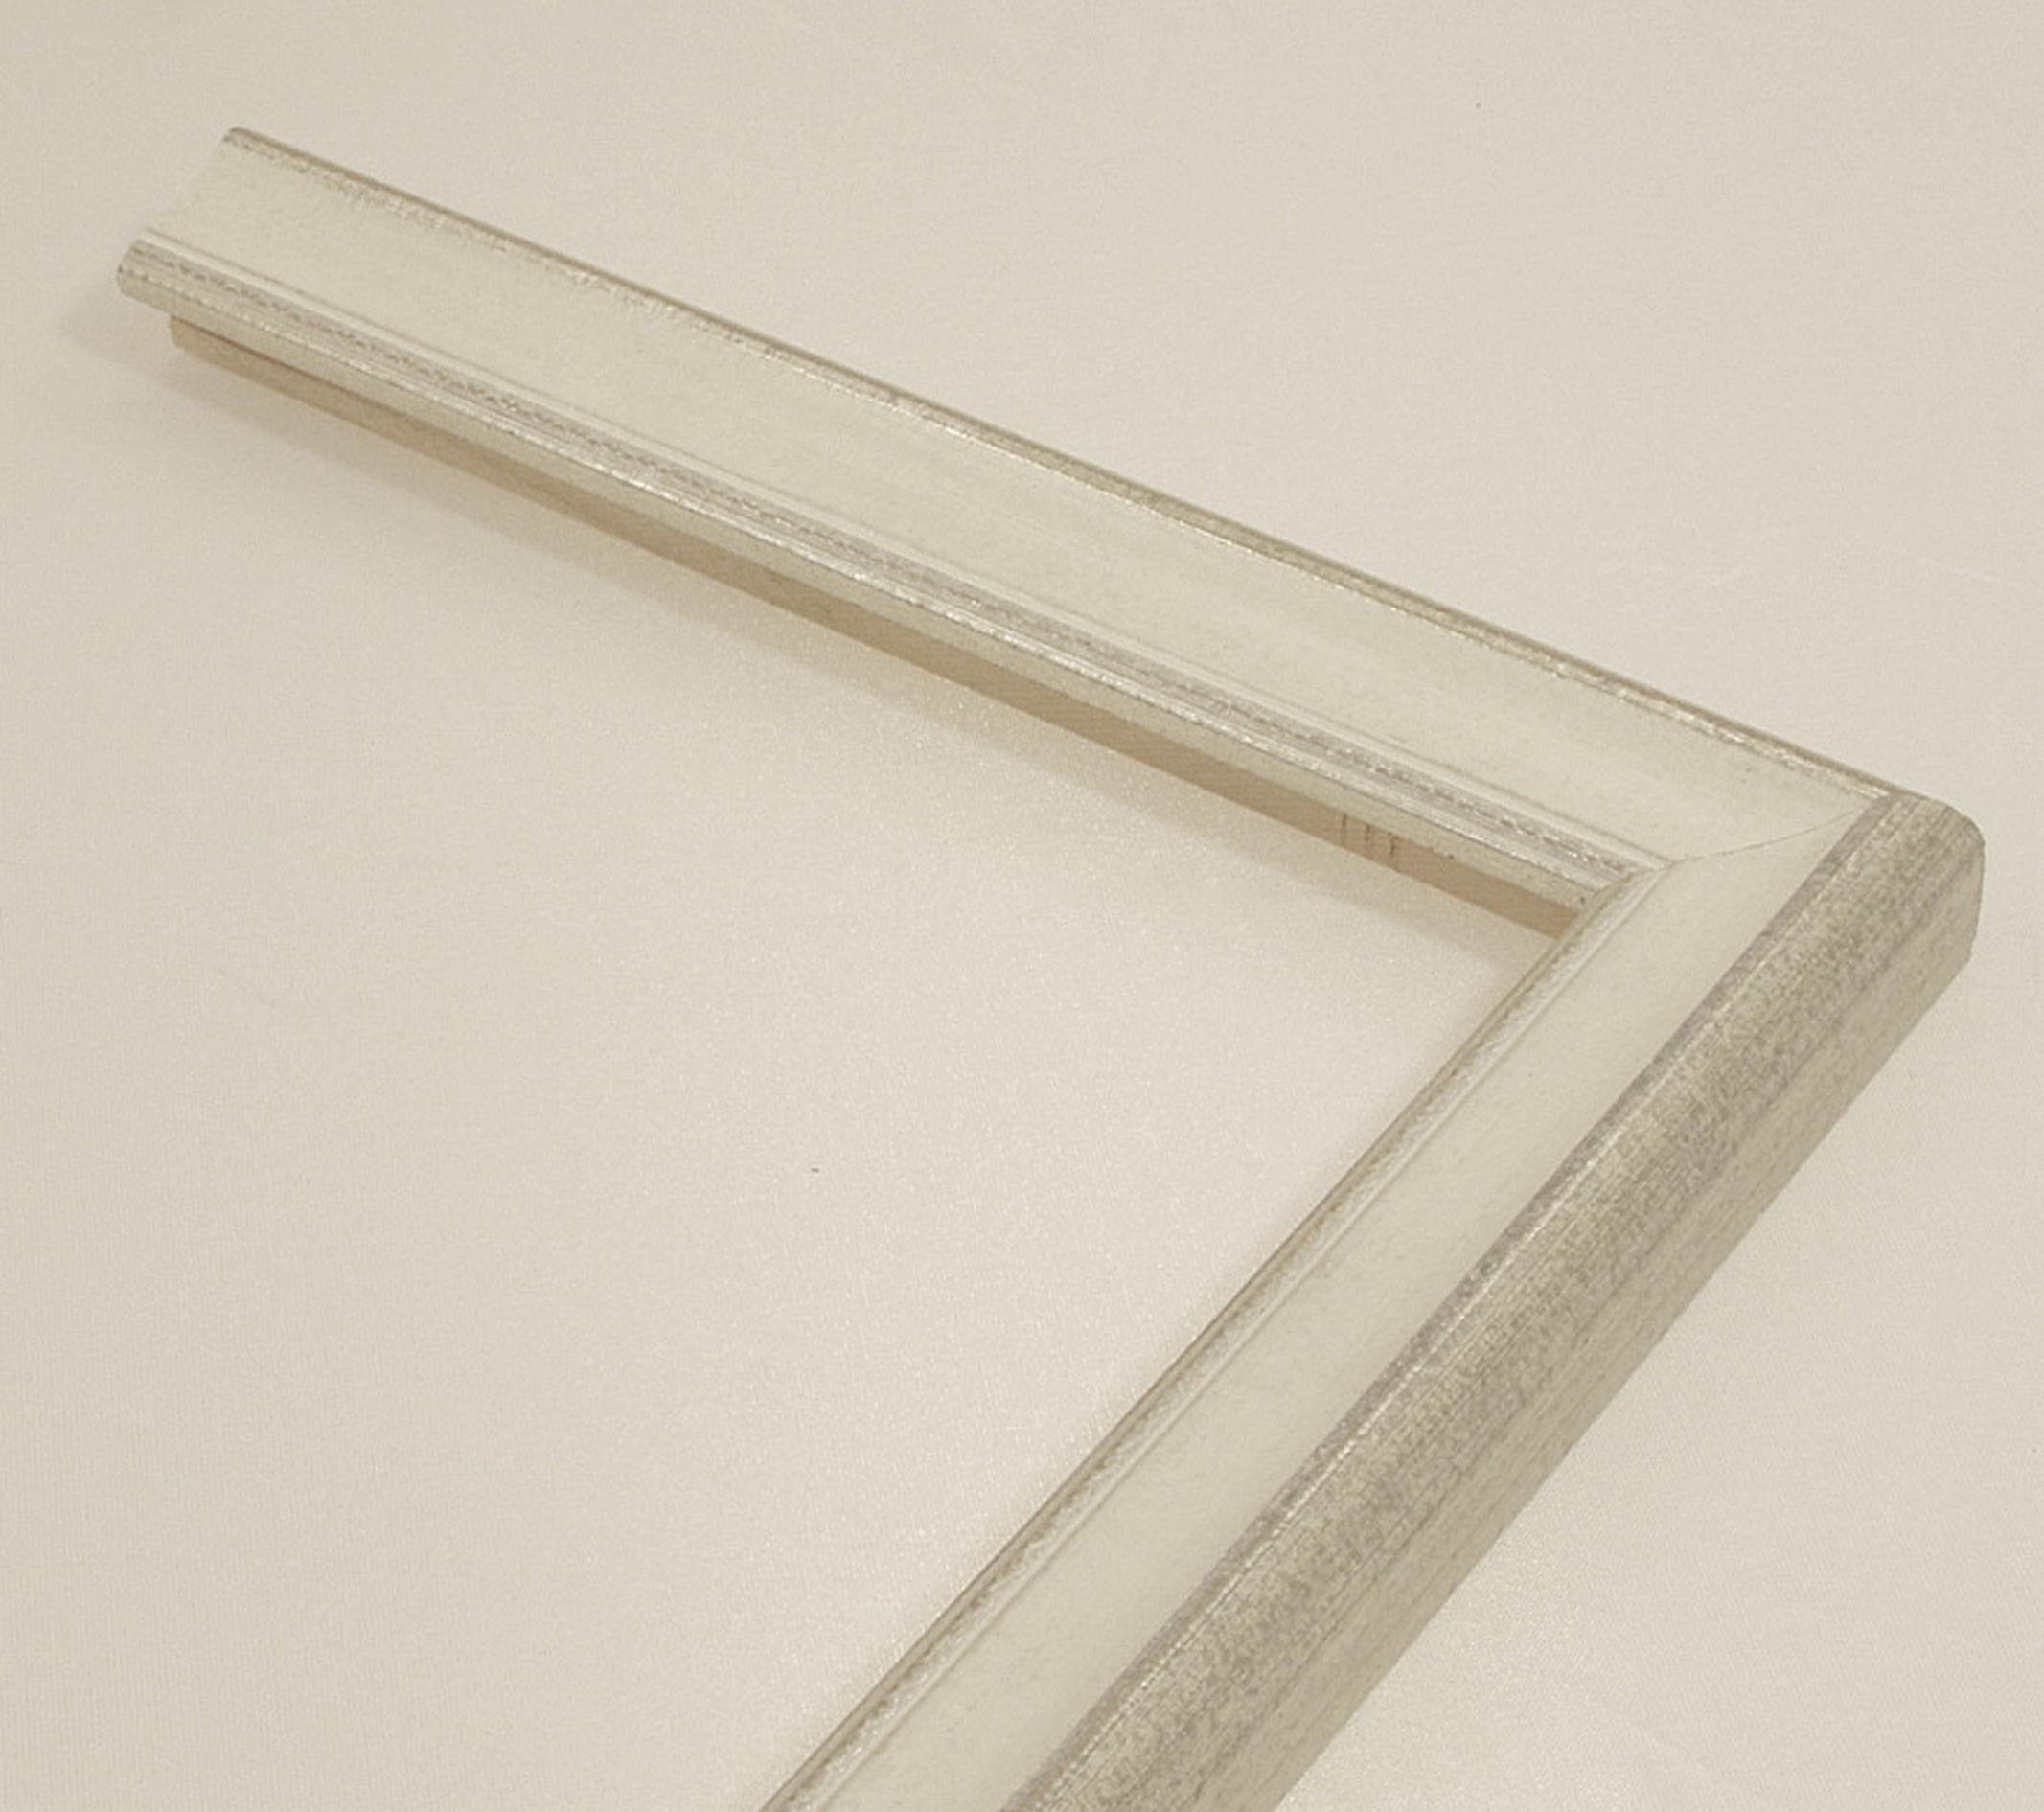 Bilderrahmen Karlota, Italienischer Bilderrahmen - Weiß, Silber